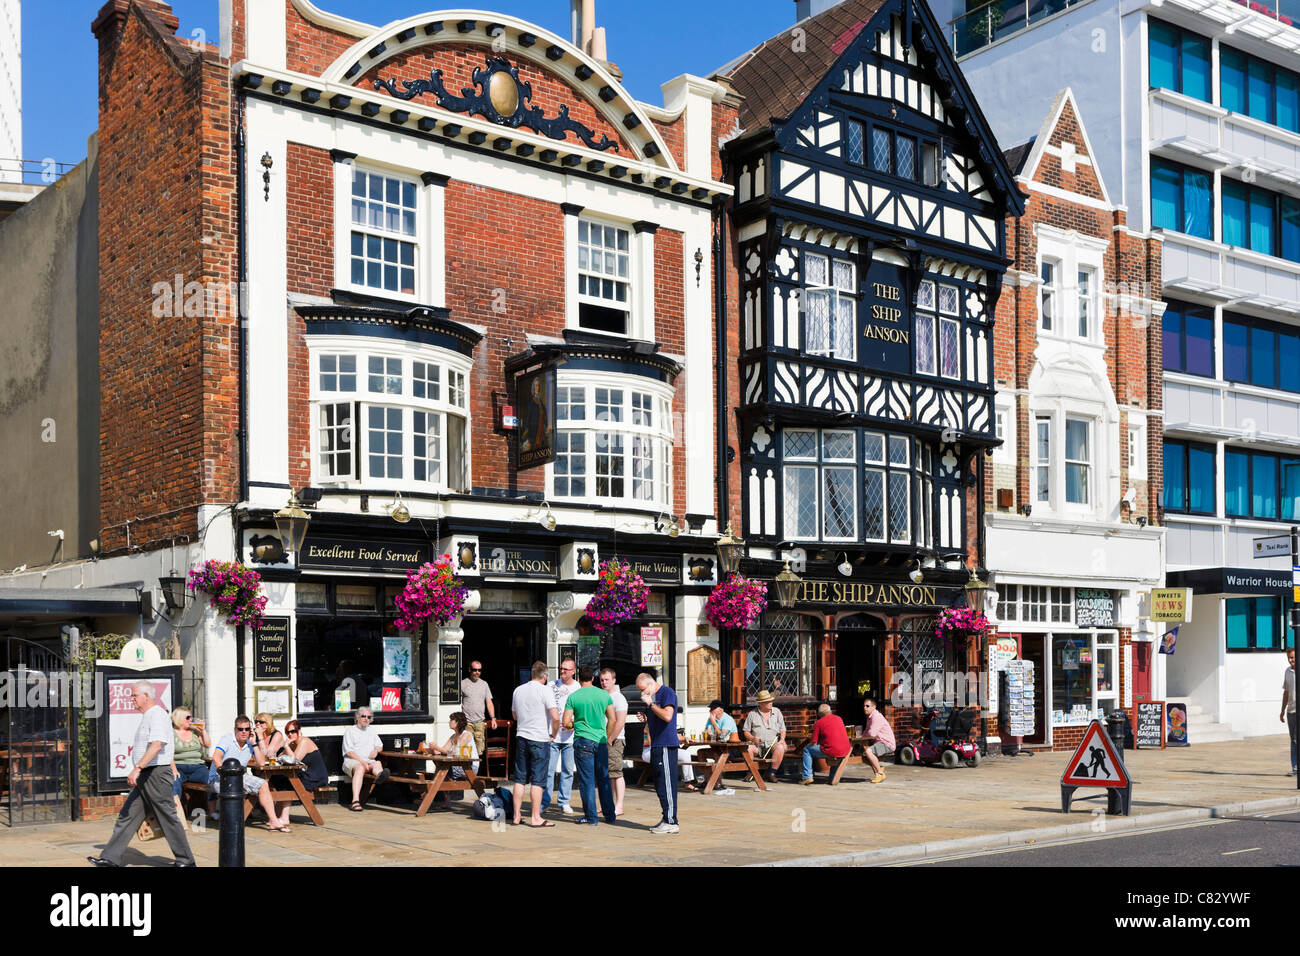 The Ship Anson pub on The Hard near the Historic Dockyard, Portsmouth, Hampshire, England, UK - Stock Image